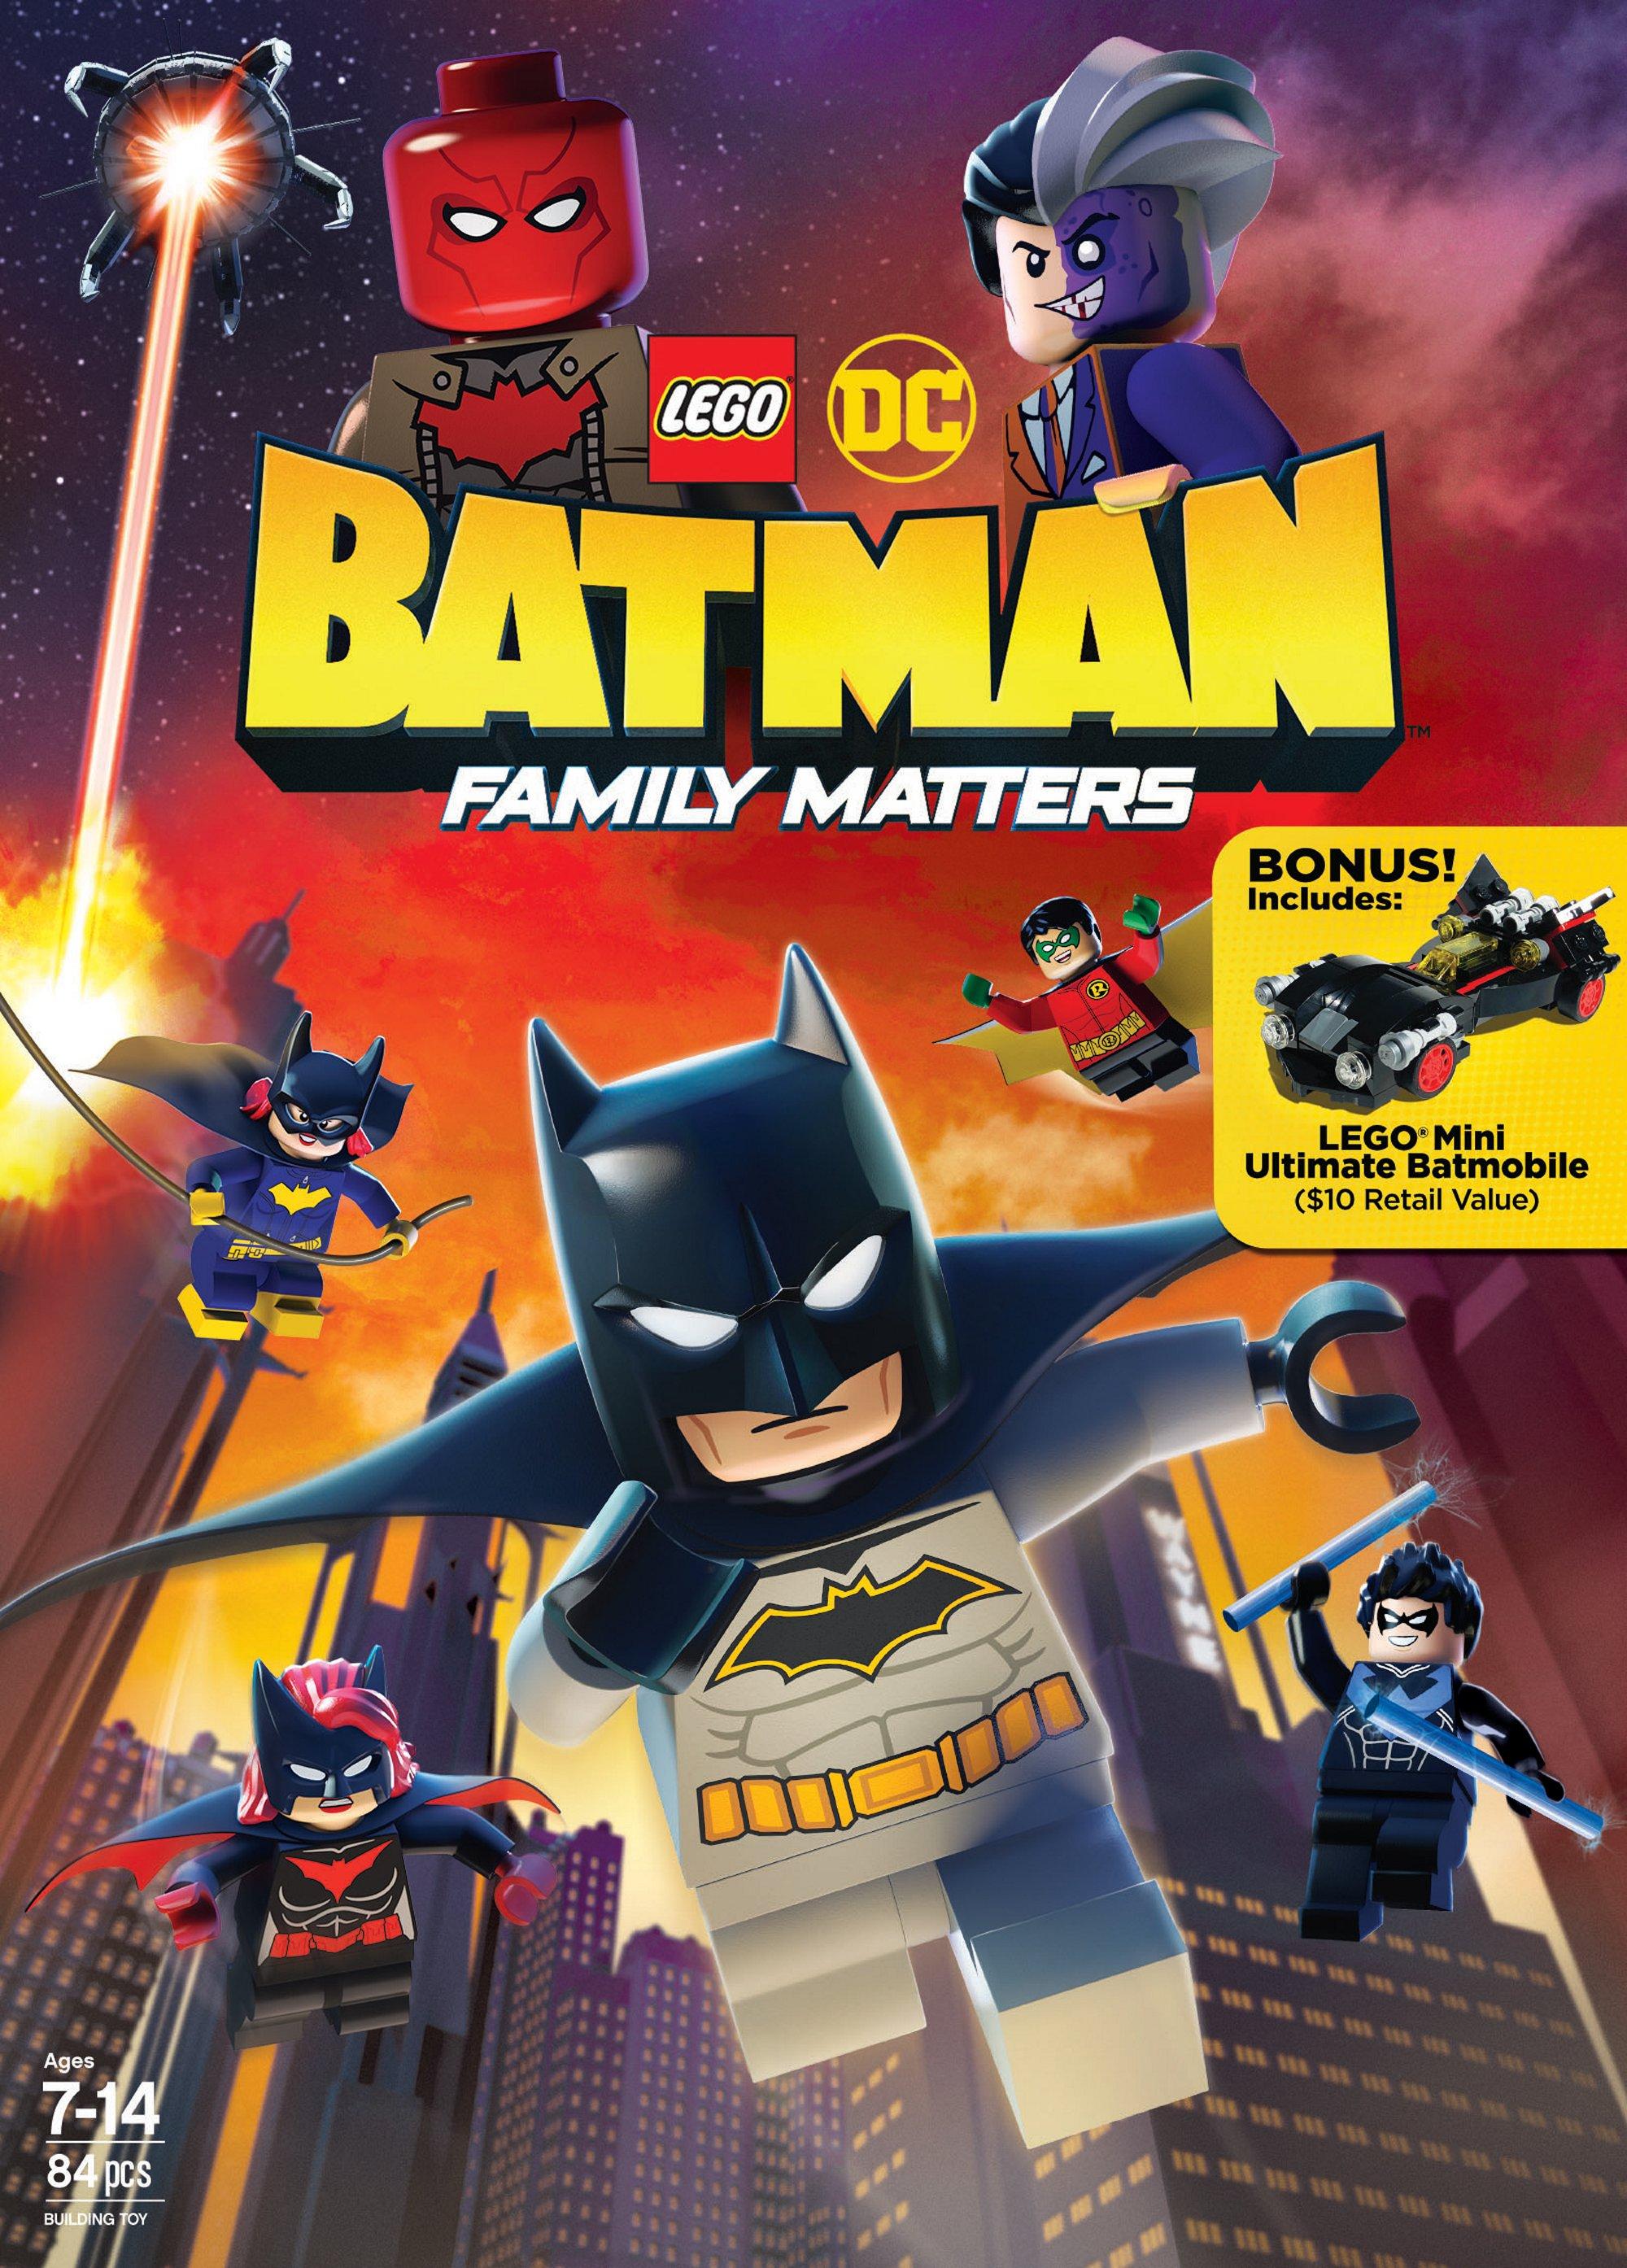 LEGO DC Batman Family Matters DVD 2D.JPEG